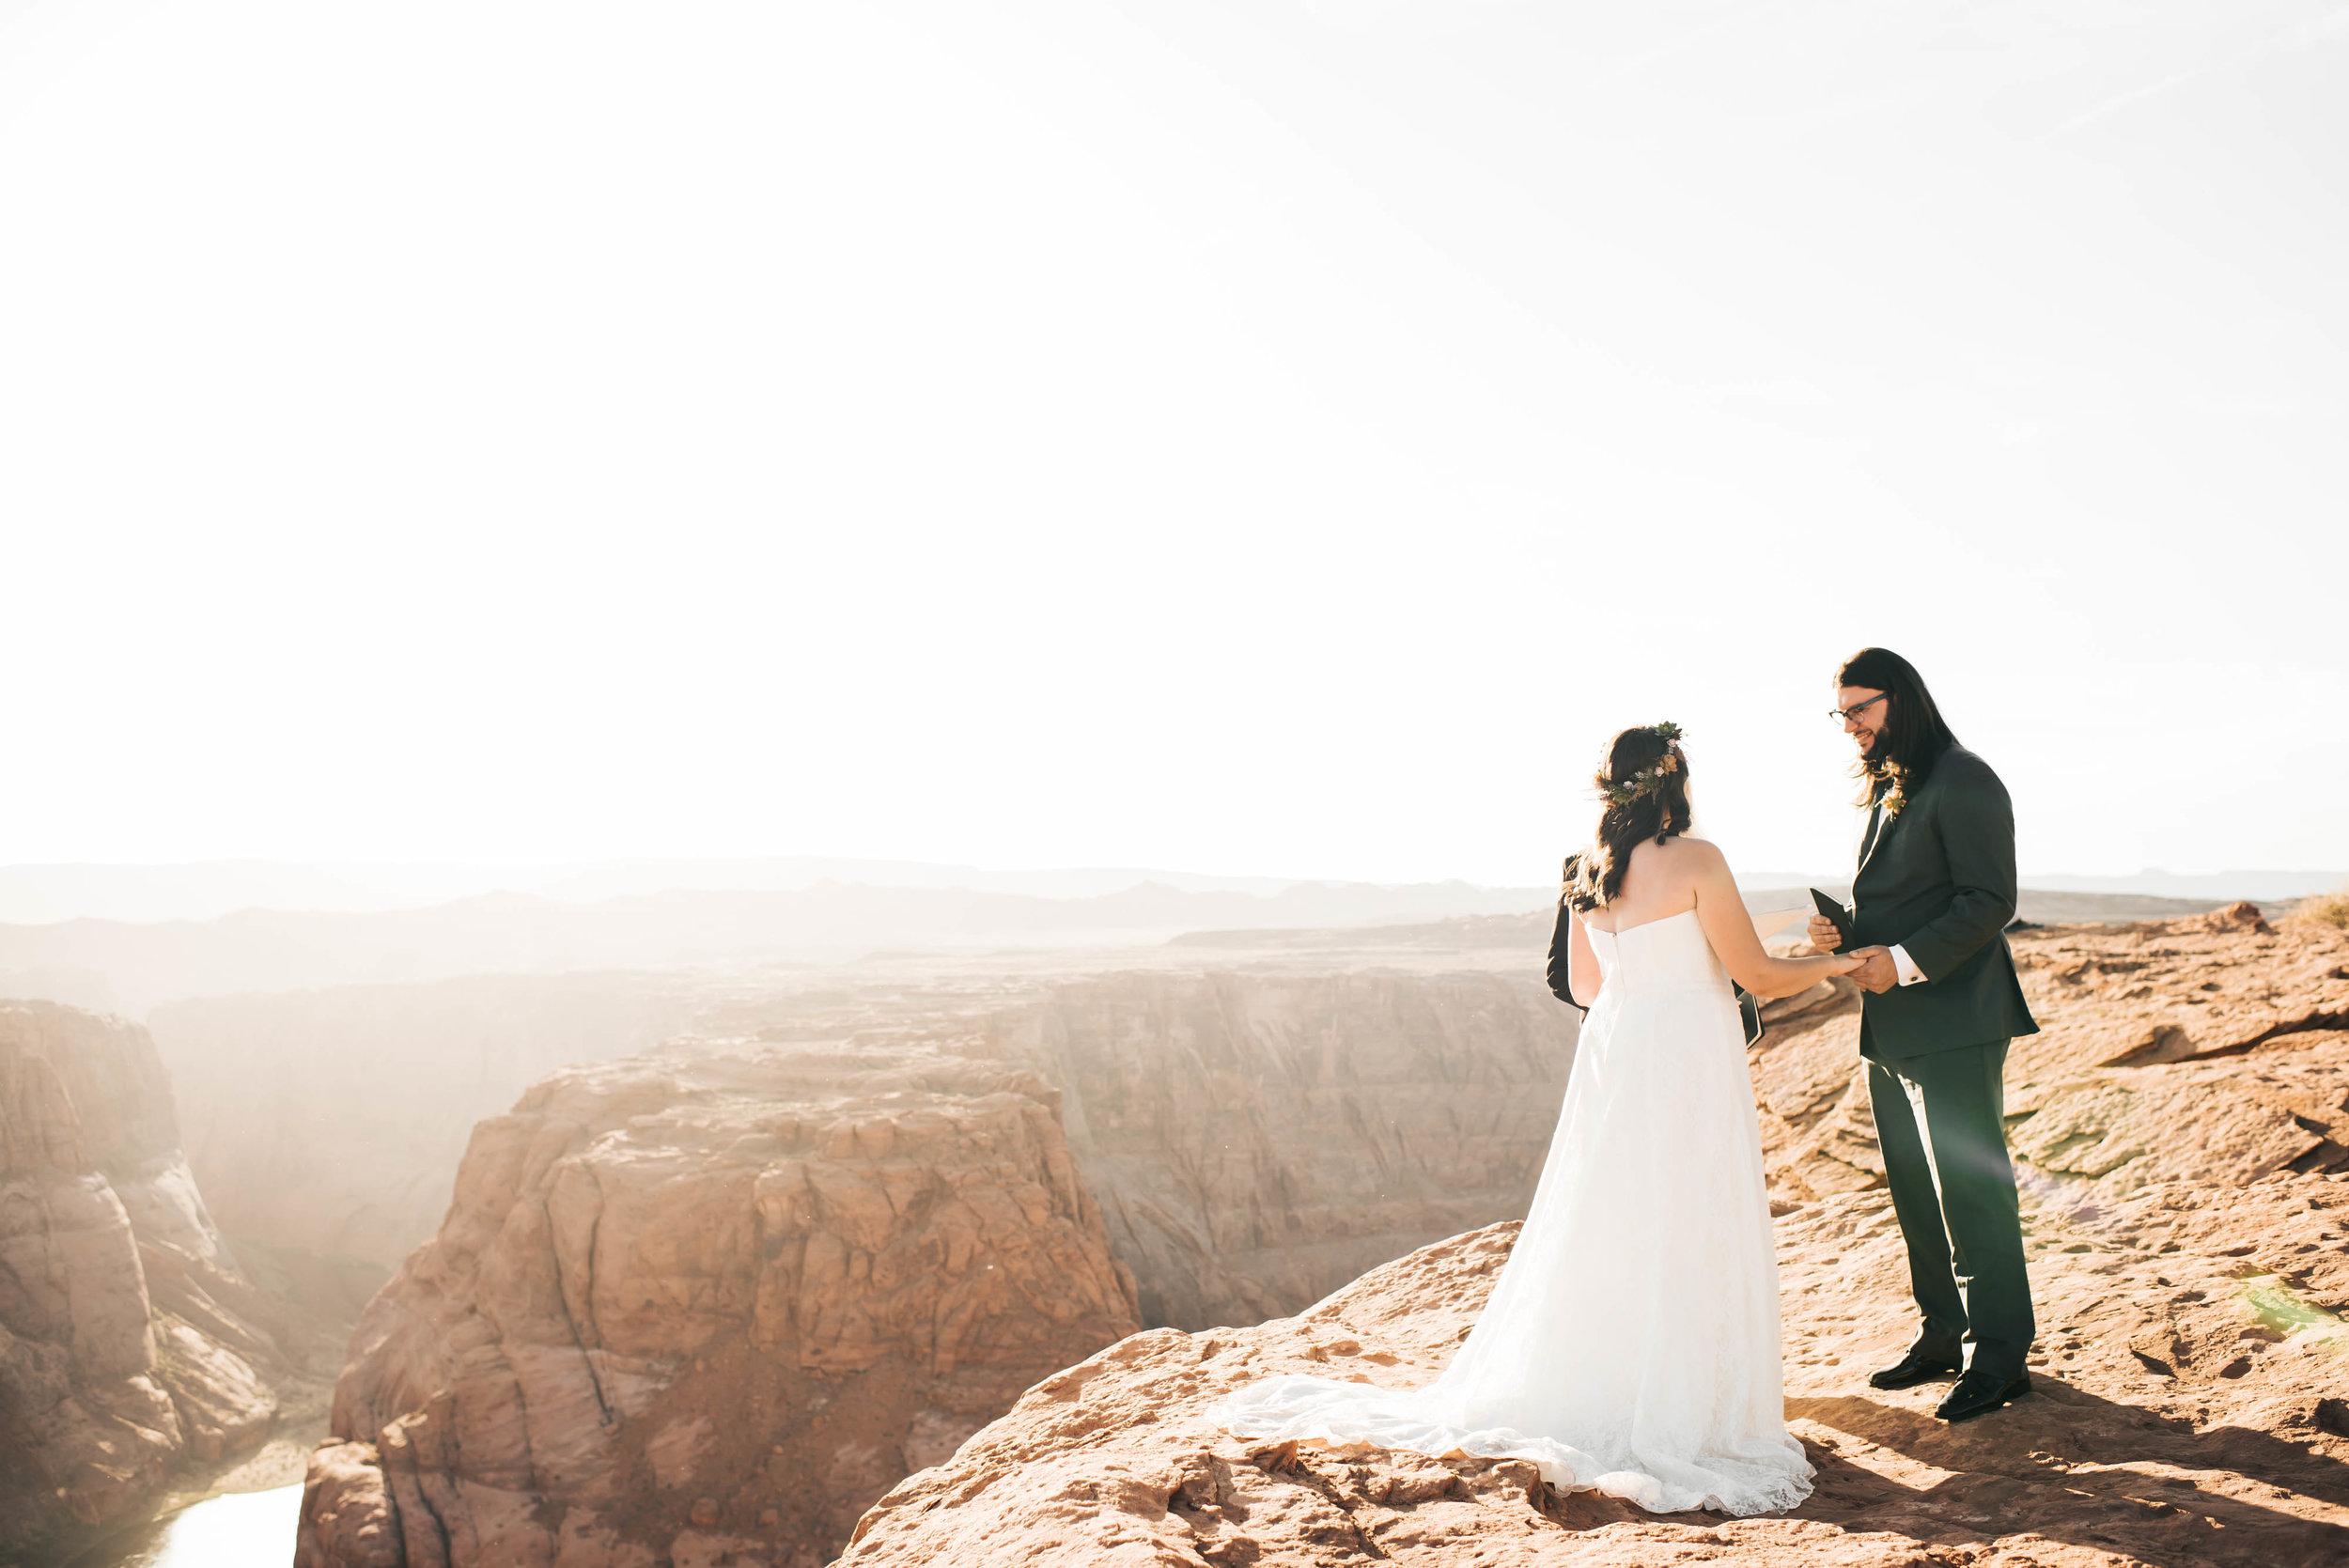 oregon arizon california utah georgia nontraditional adventure wedding elopement photographer-275.jpg